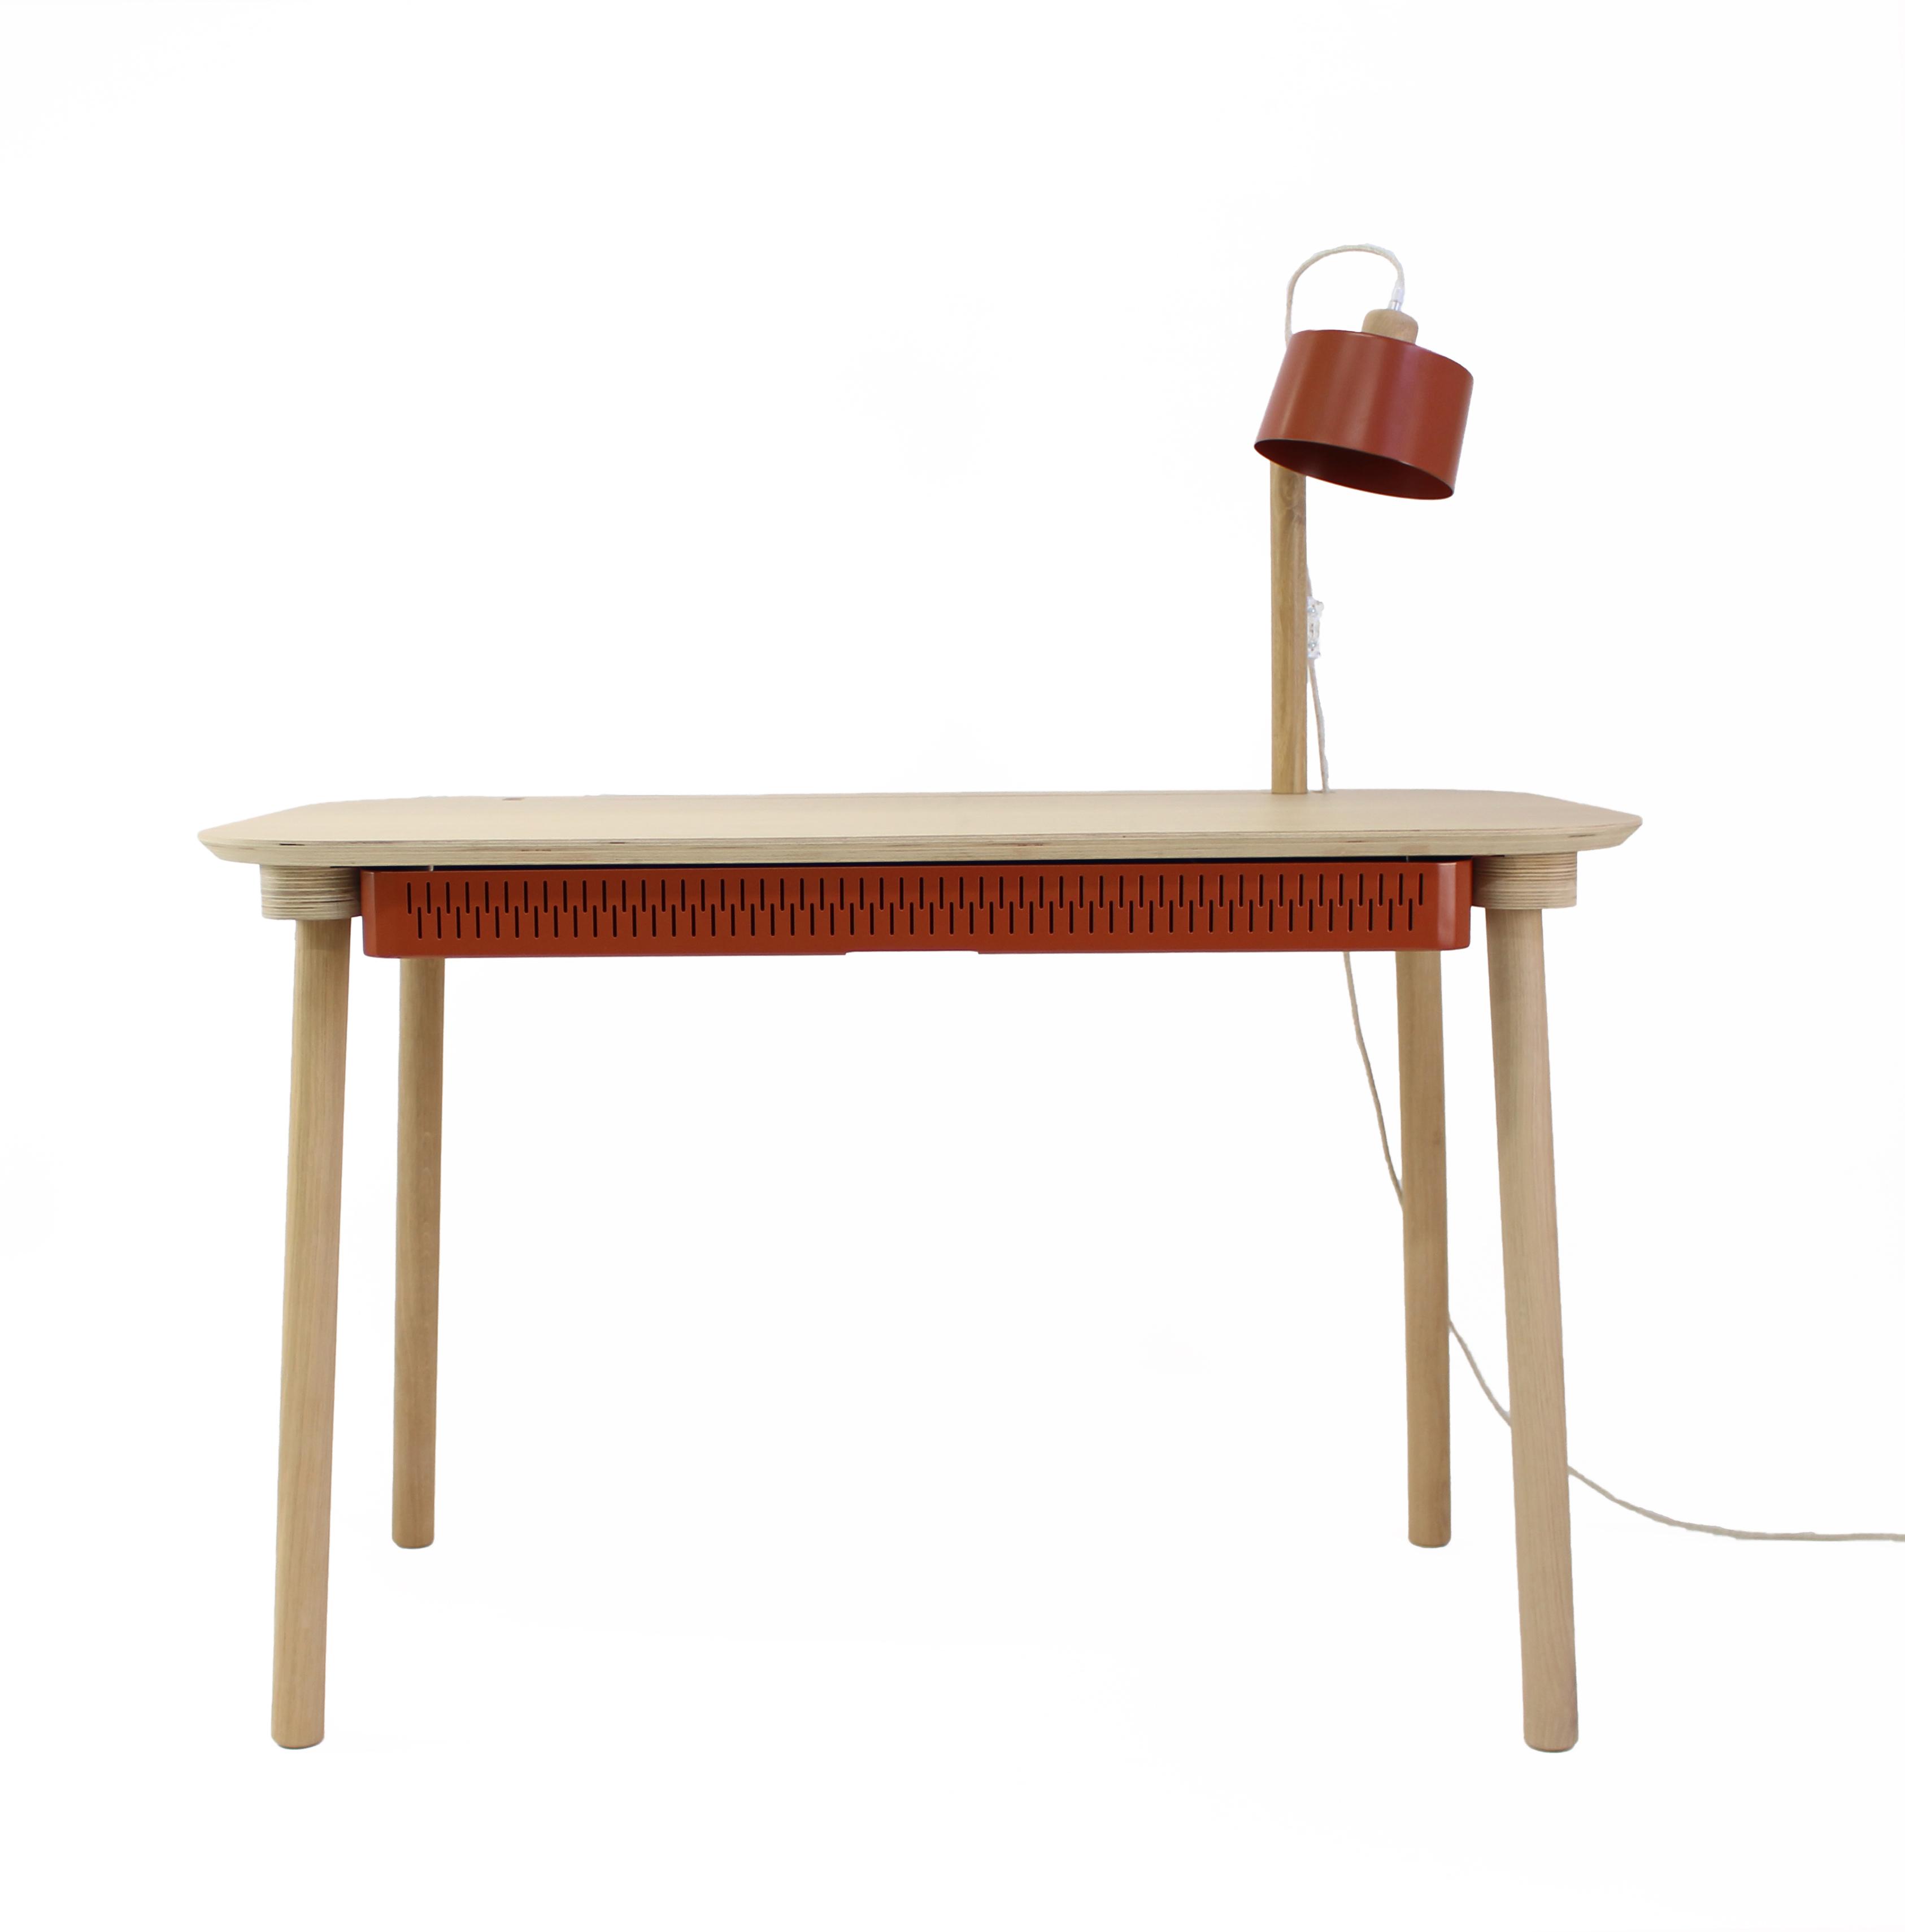 Bureau en chêne avec lampe et tiroir en métal terracotta